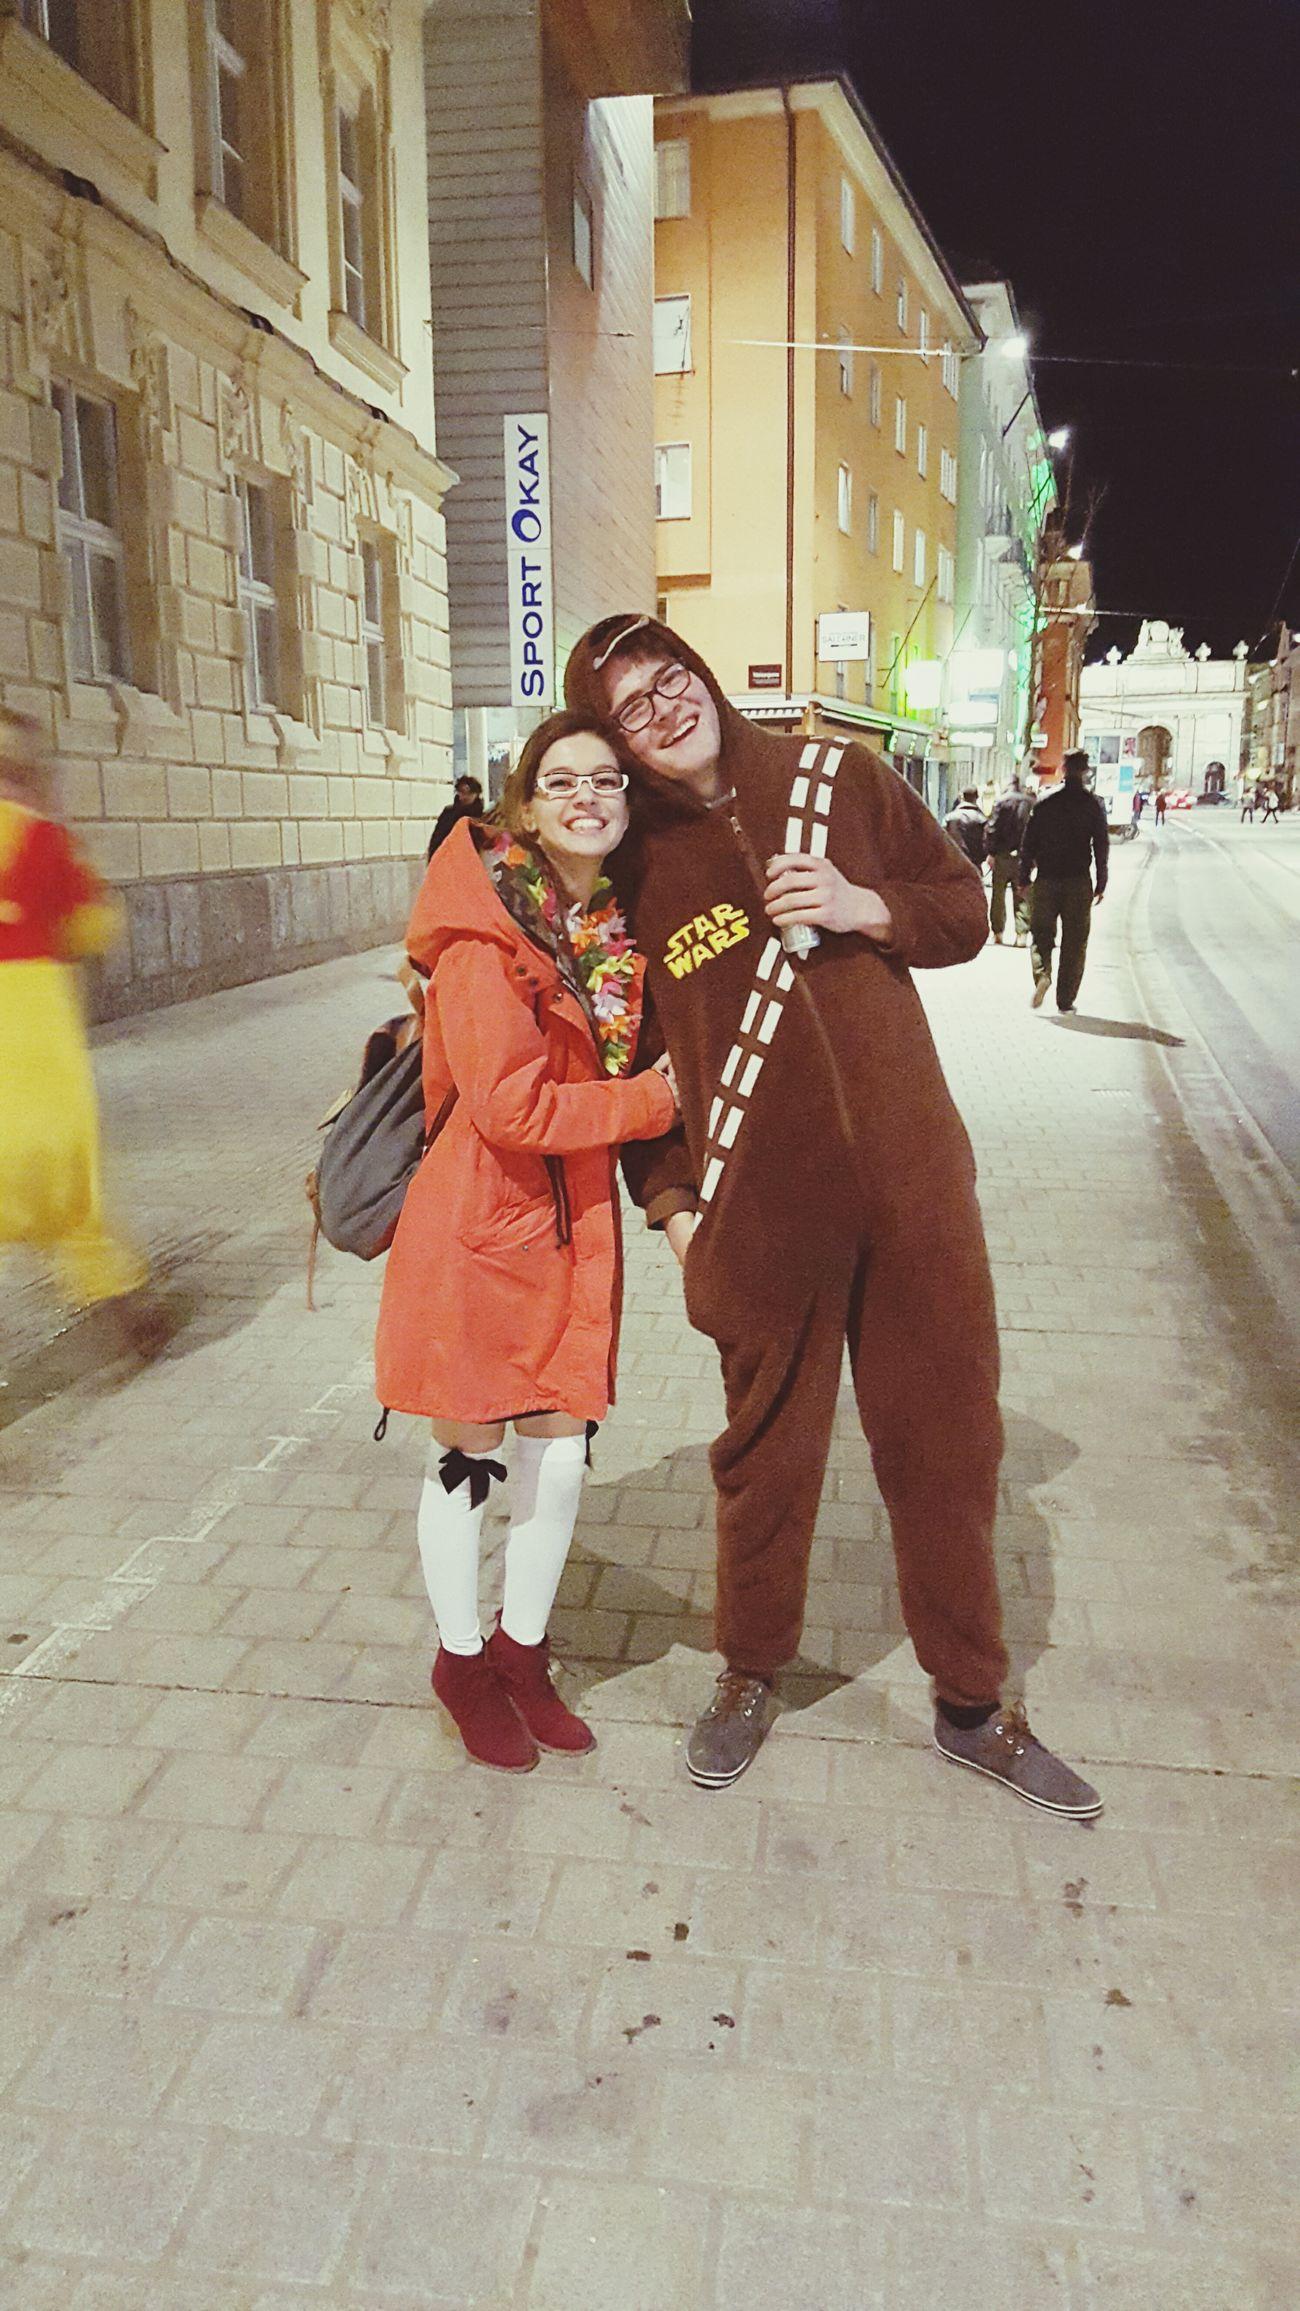 Star Wars Chubaka Fasching Party Time That's Me :) Starwars Starwarslove Starwarstime